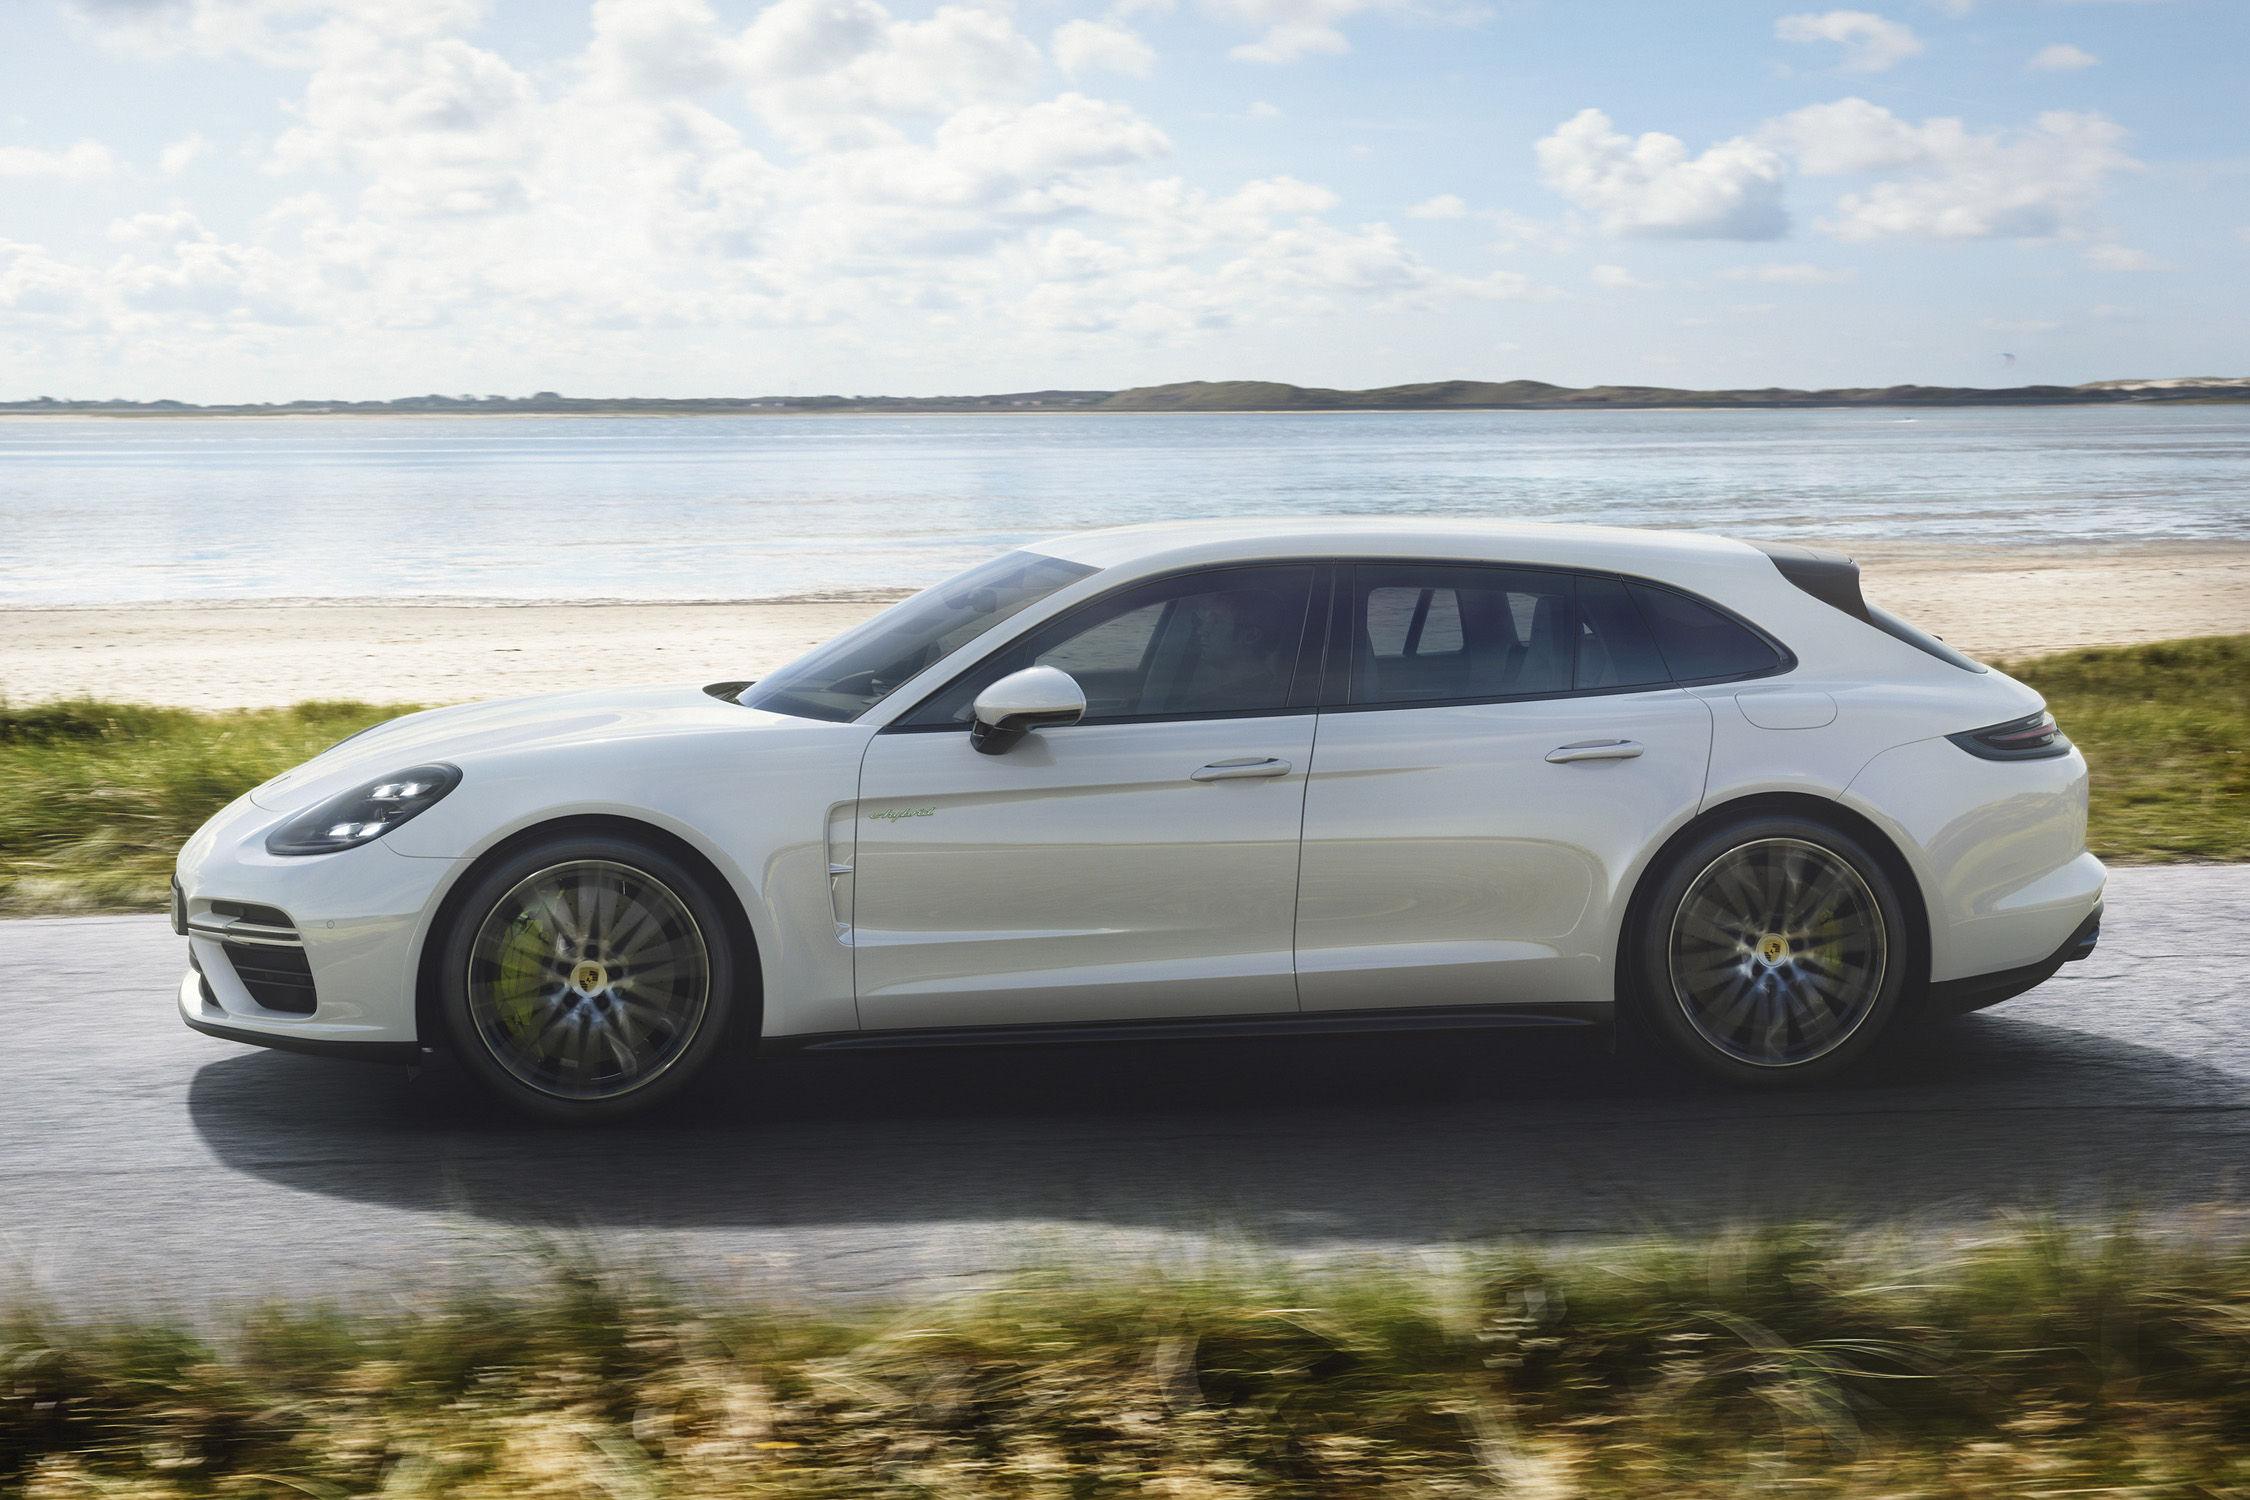 La nouvelle Porsche Panamera Sport Turismo ajoute une version hybride